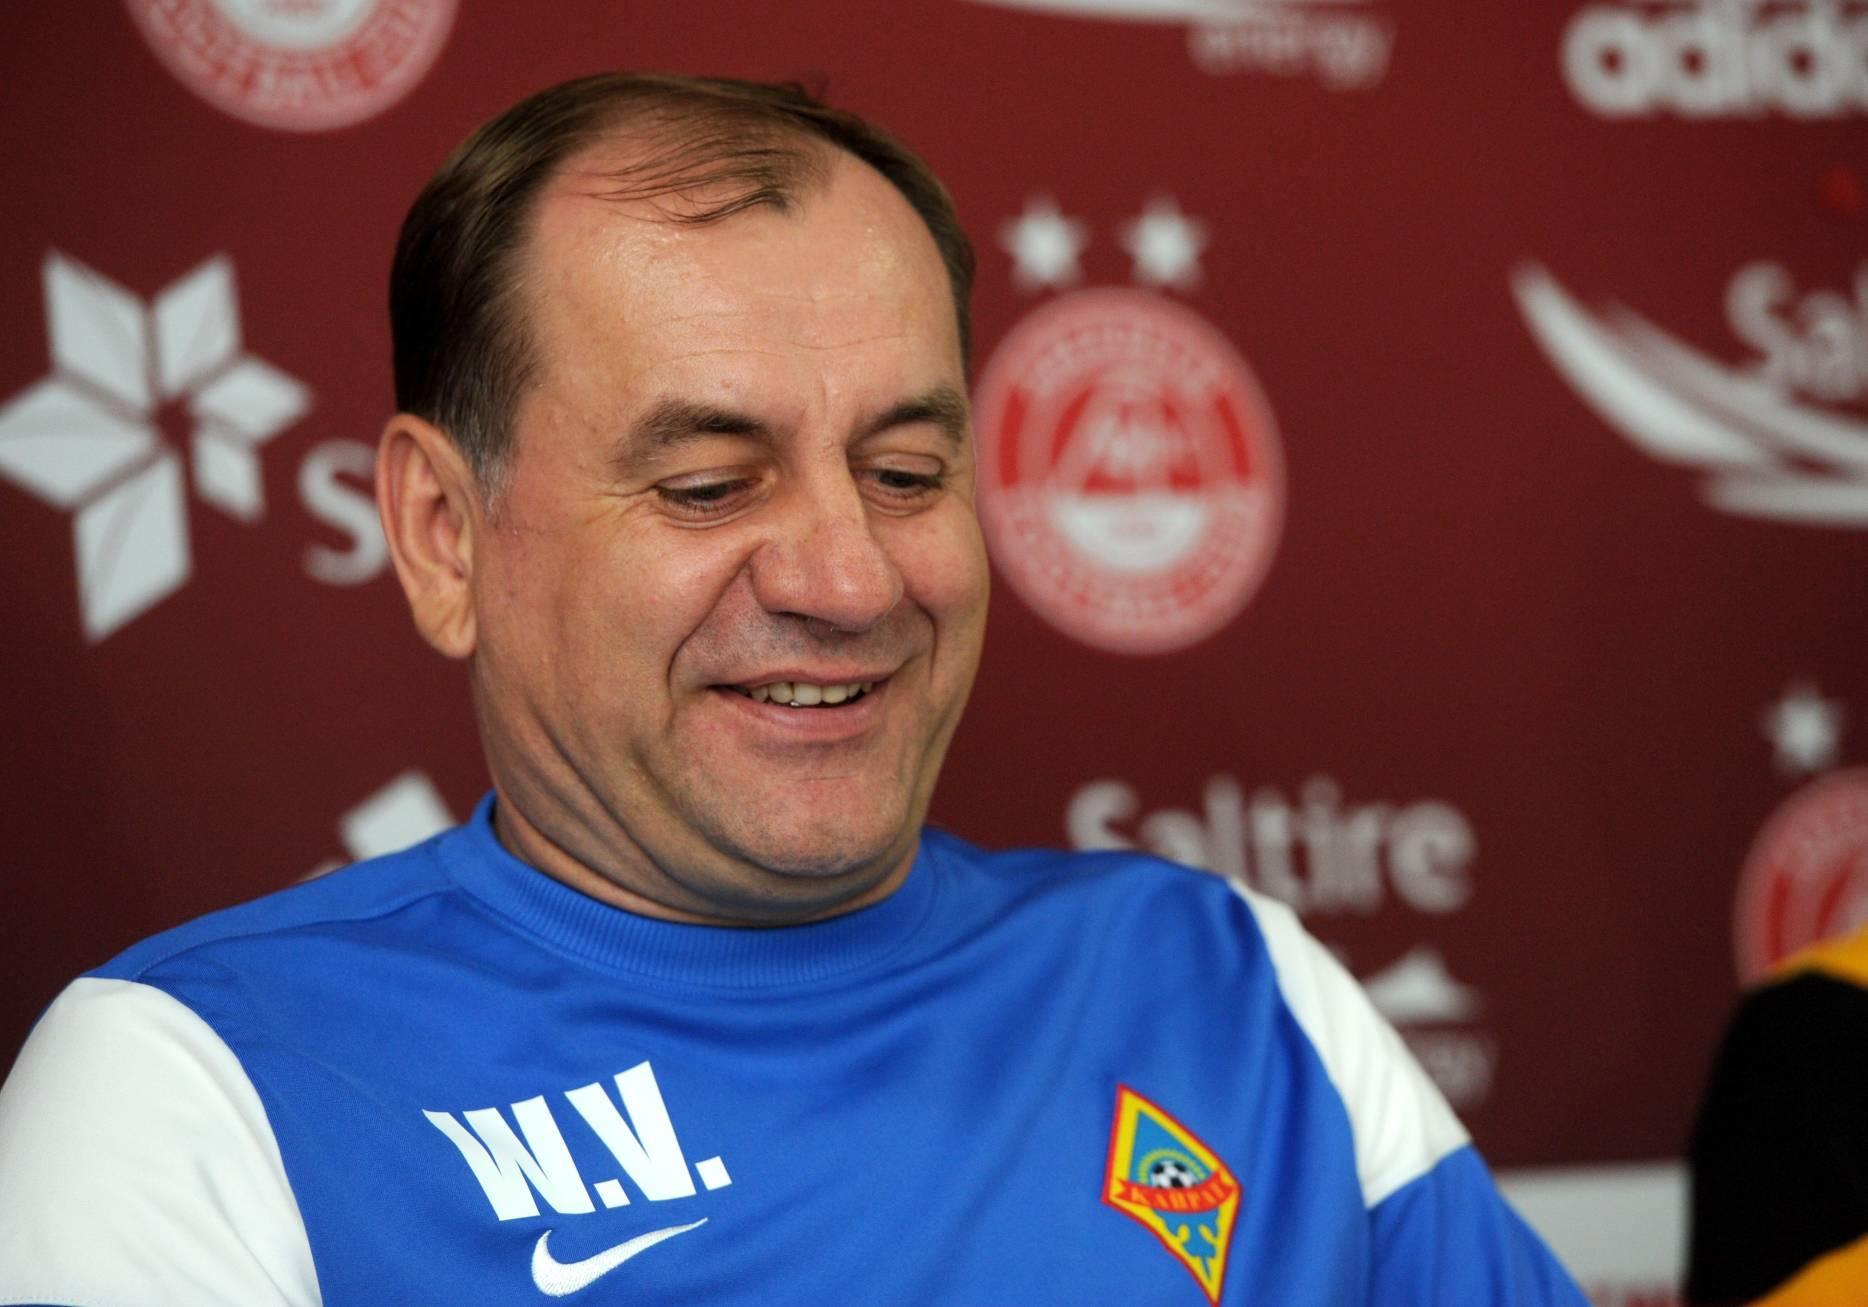 Kairat Almaty manager Vladimir Weiss